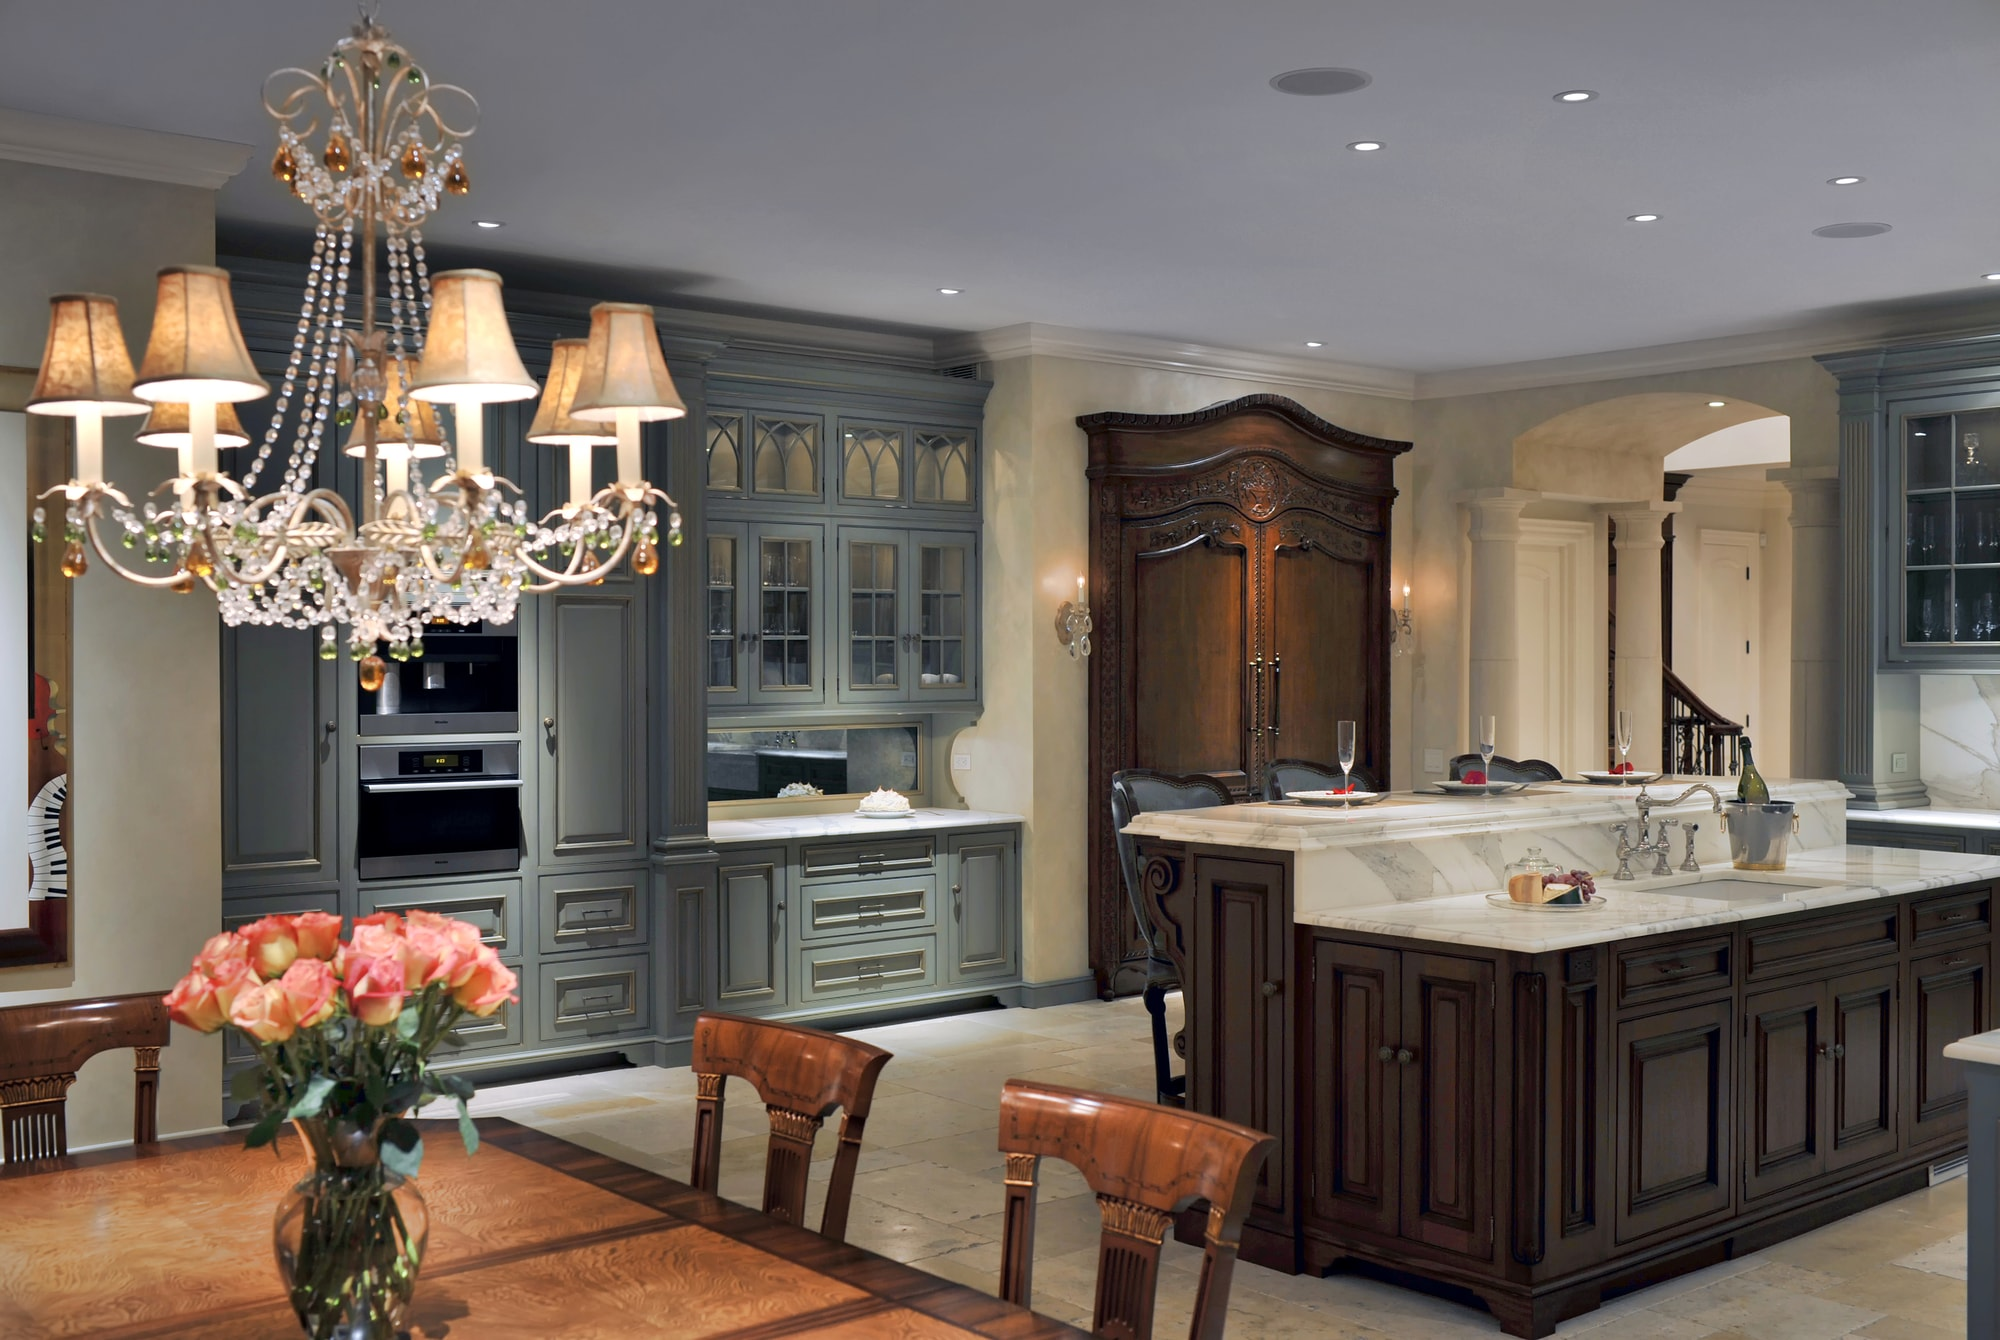 French Chateau Amazing Custom Kitchens In Long Island Showcase Kitchen Remodeling